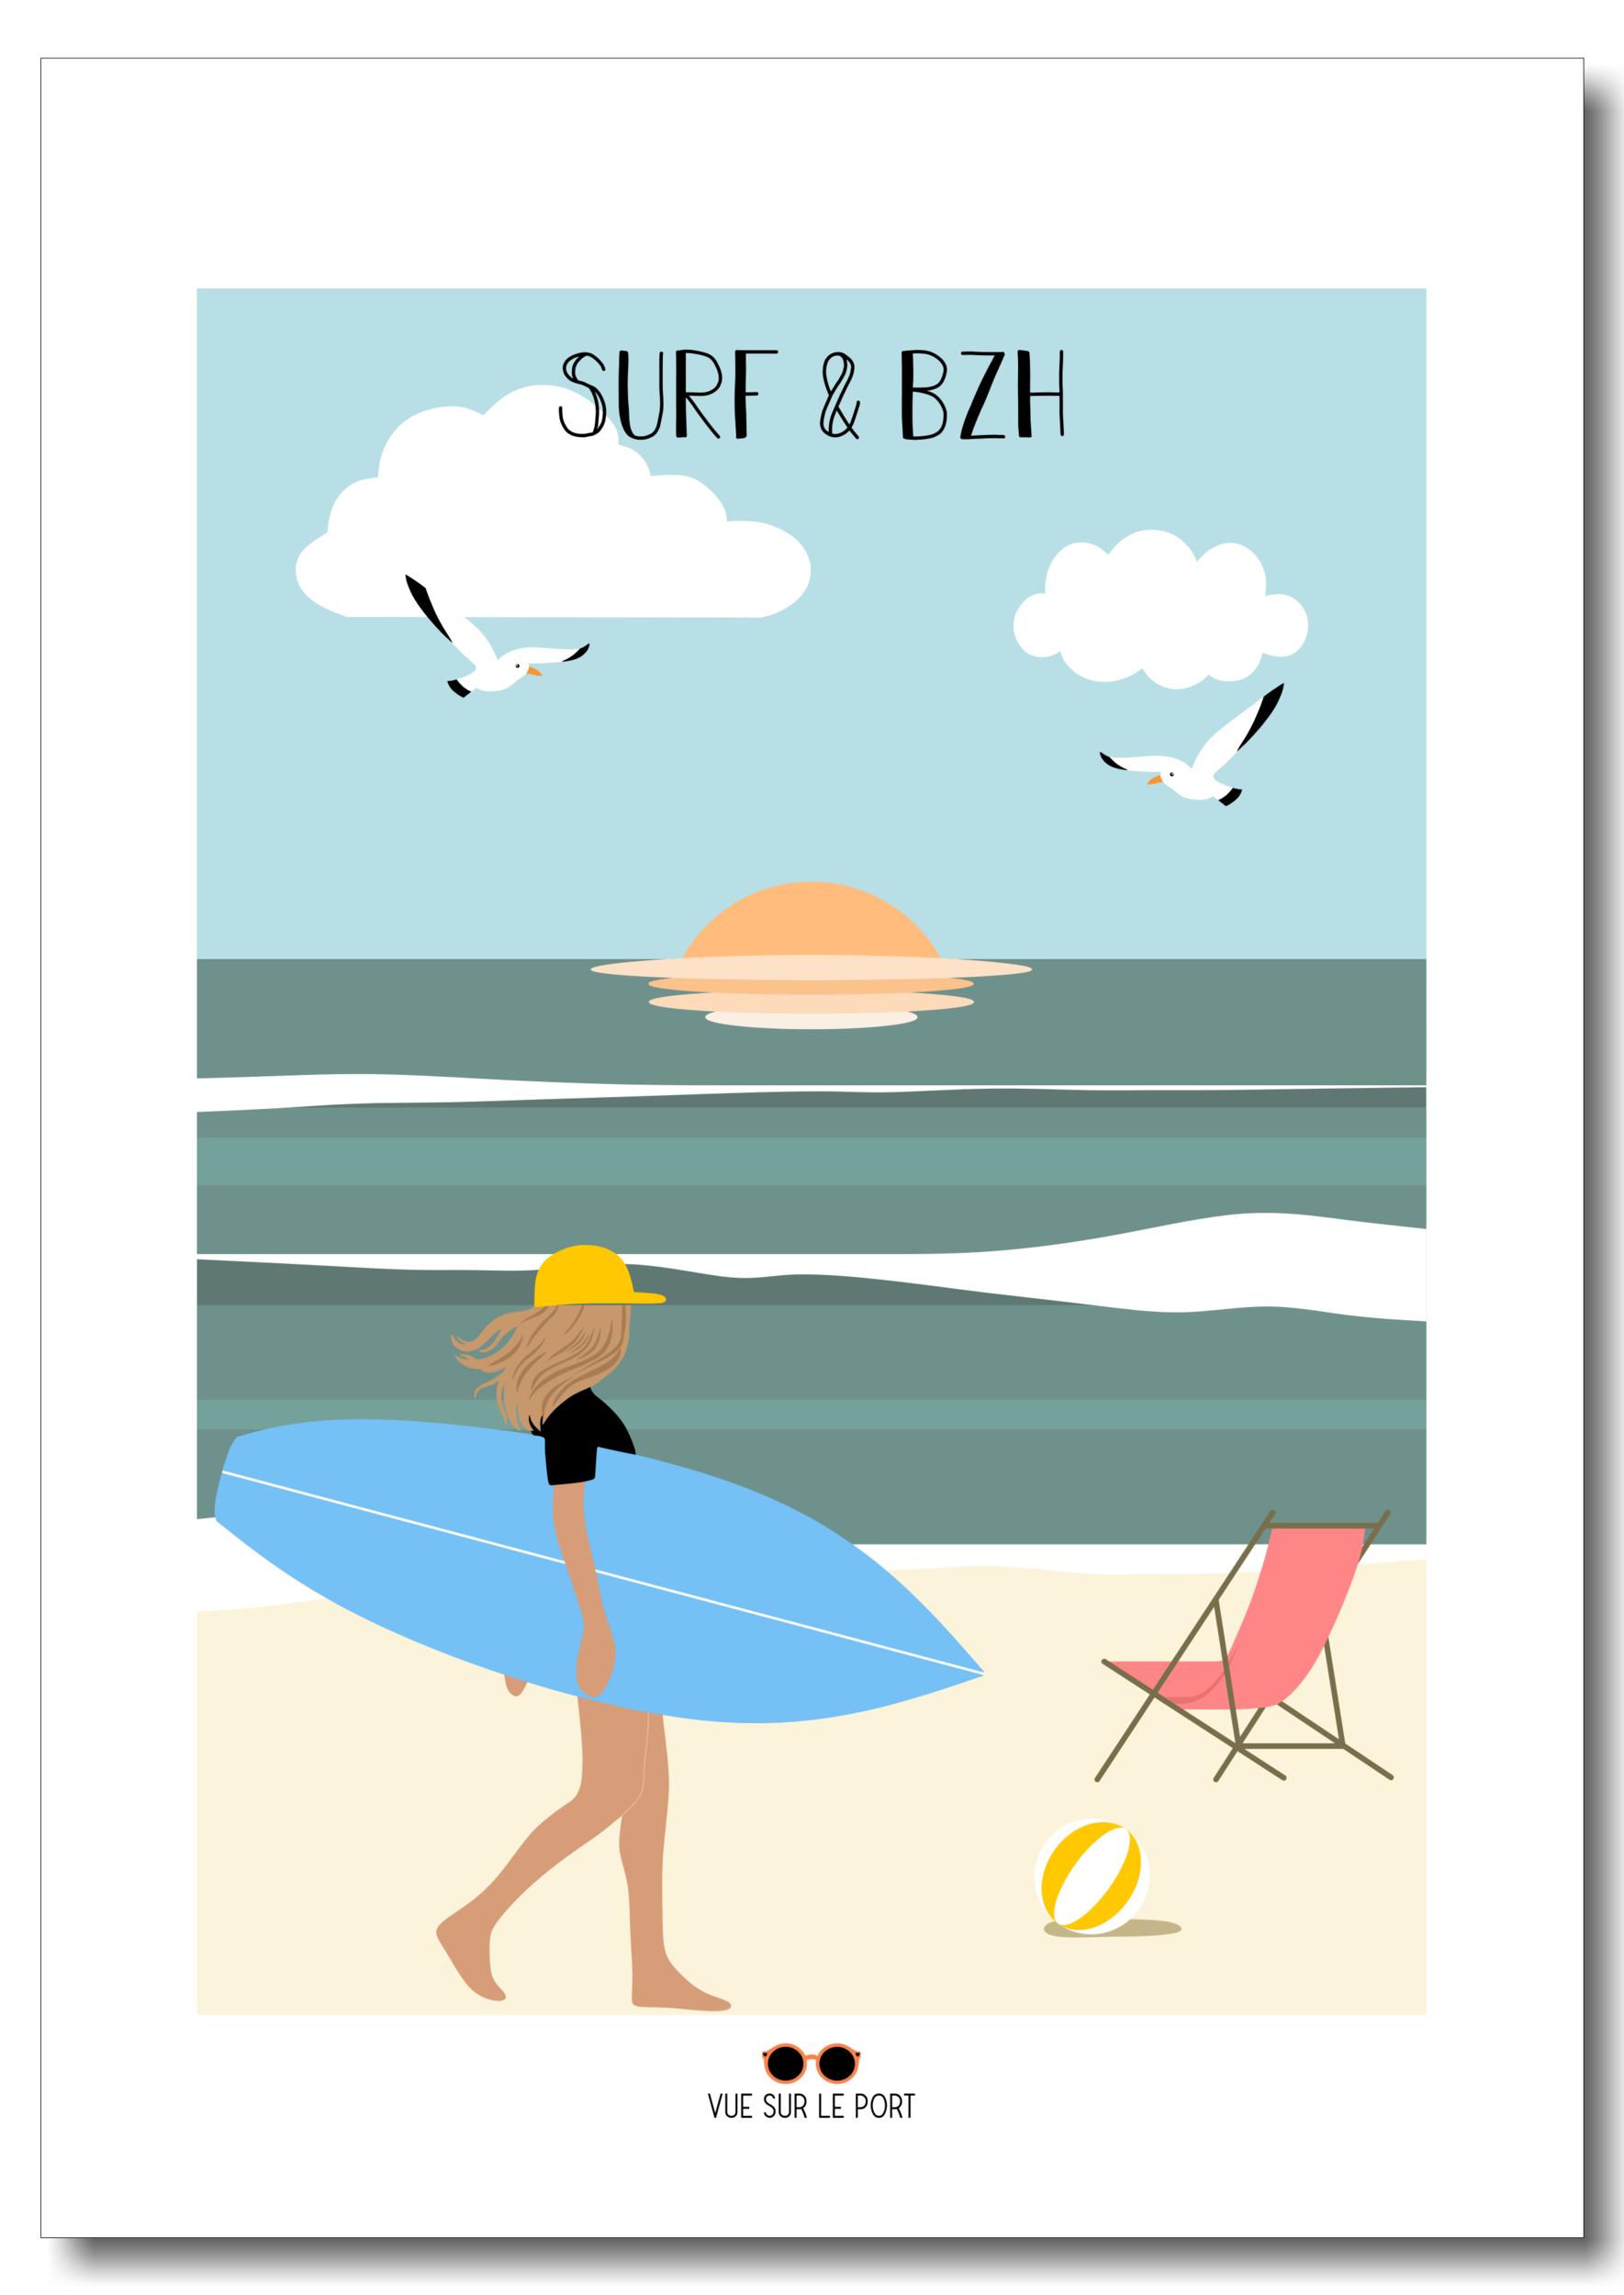 surh&bzh etsy personnalisable